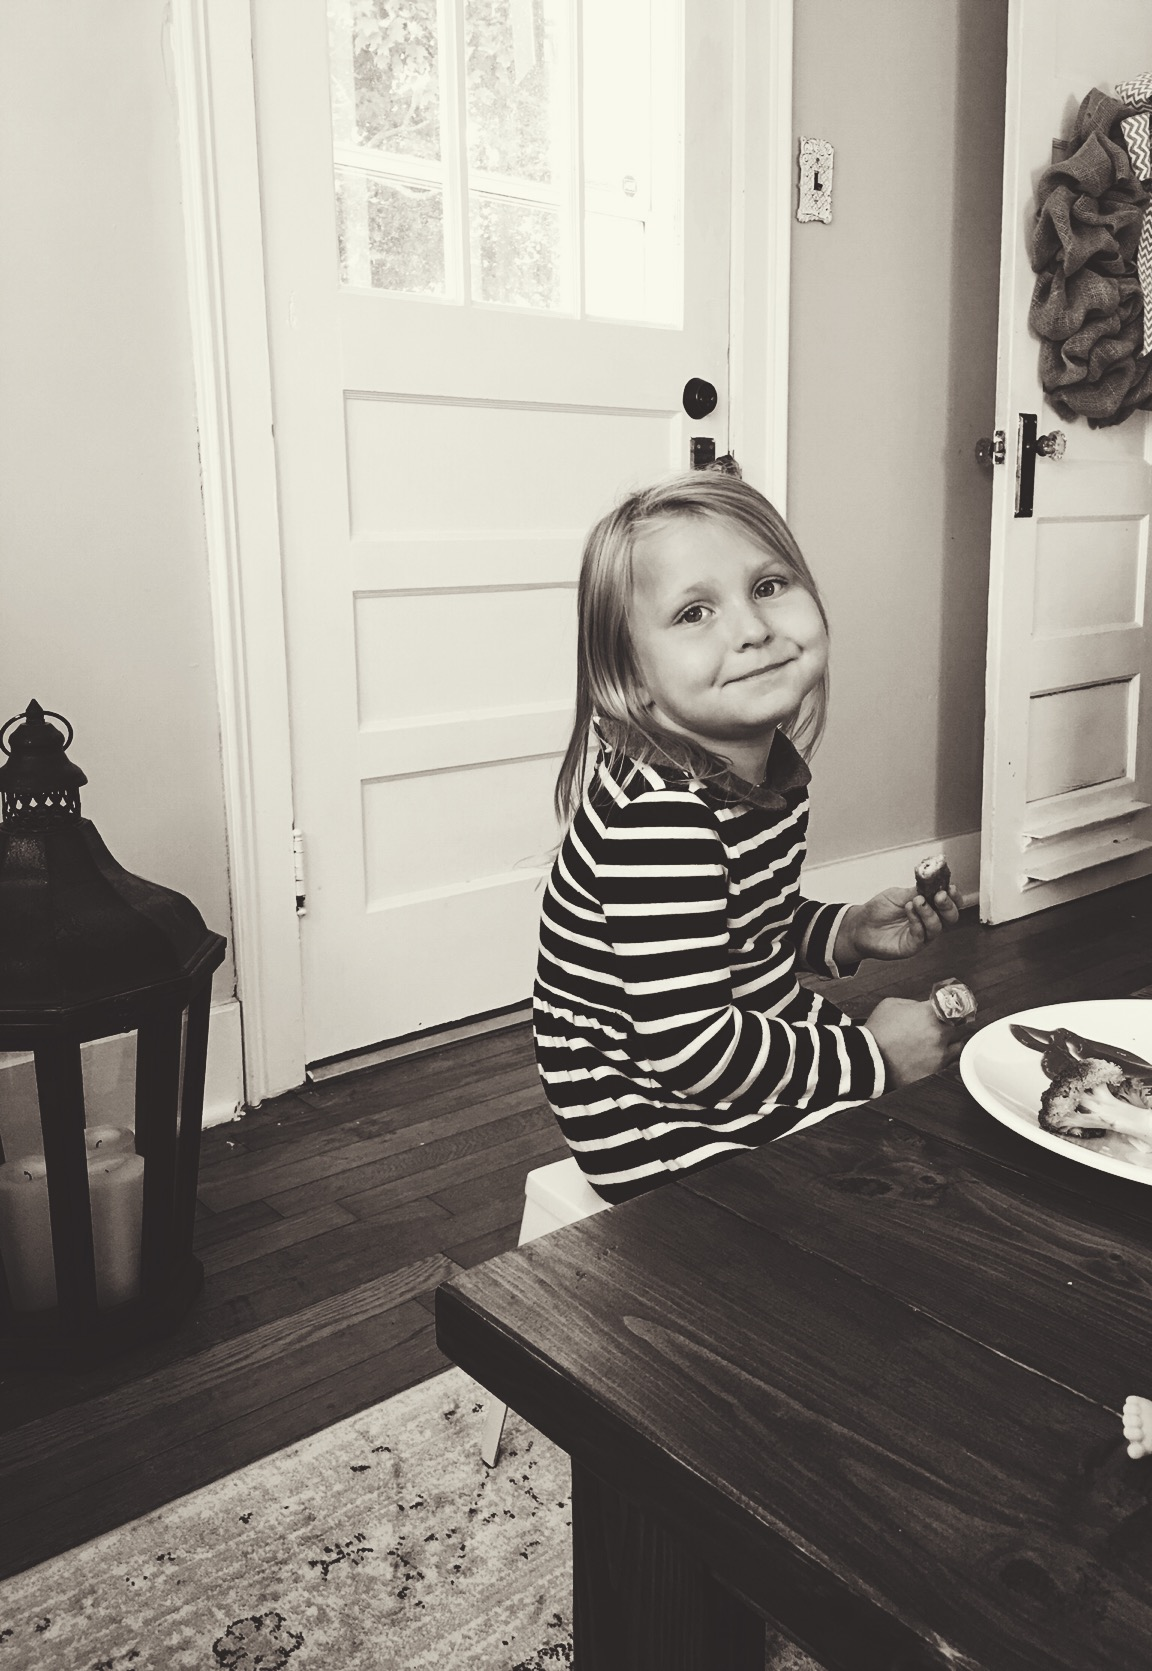 My sweet little pumpkin 🎃❤️